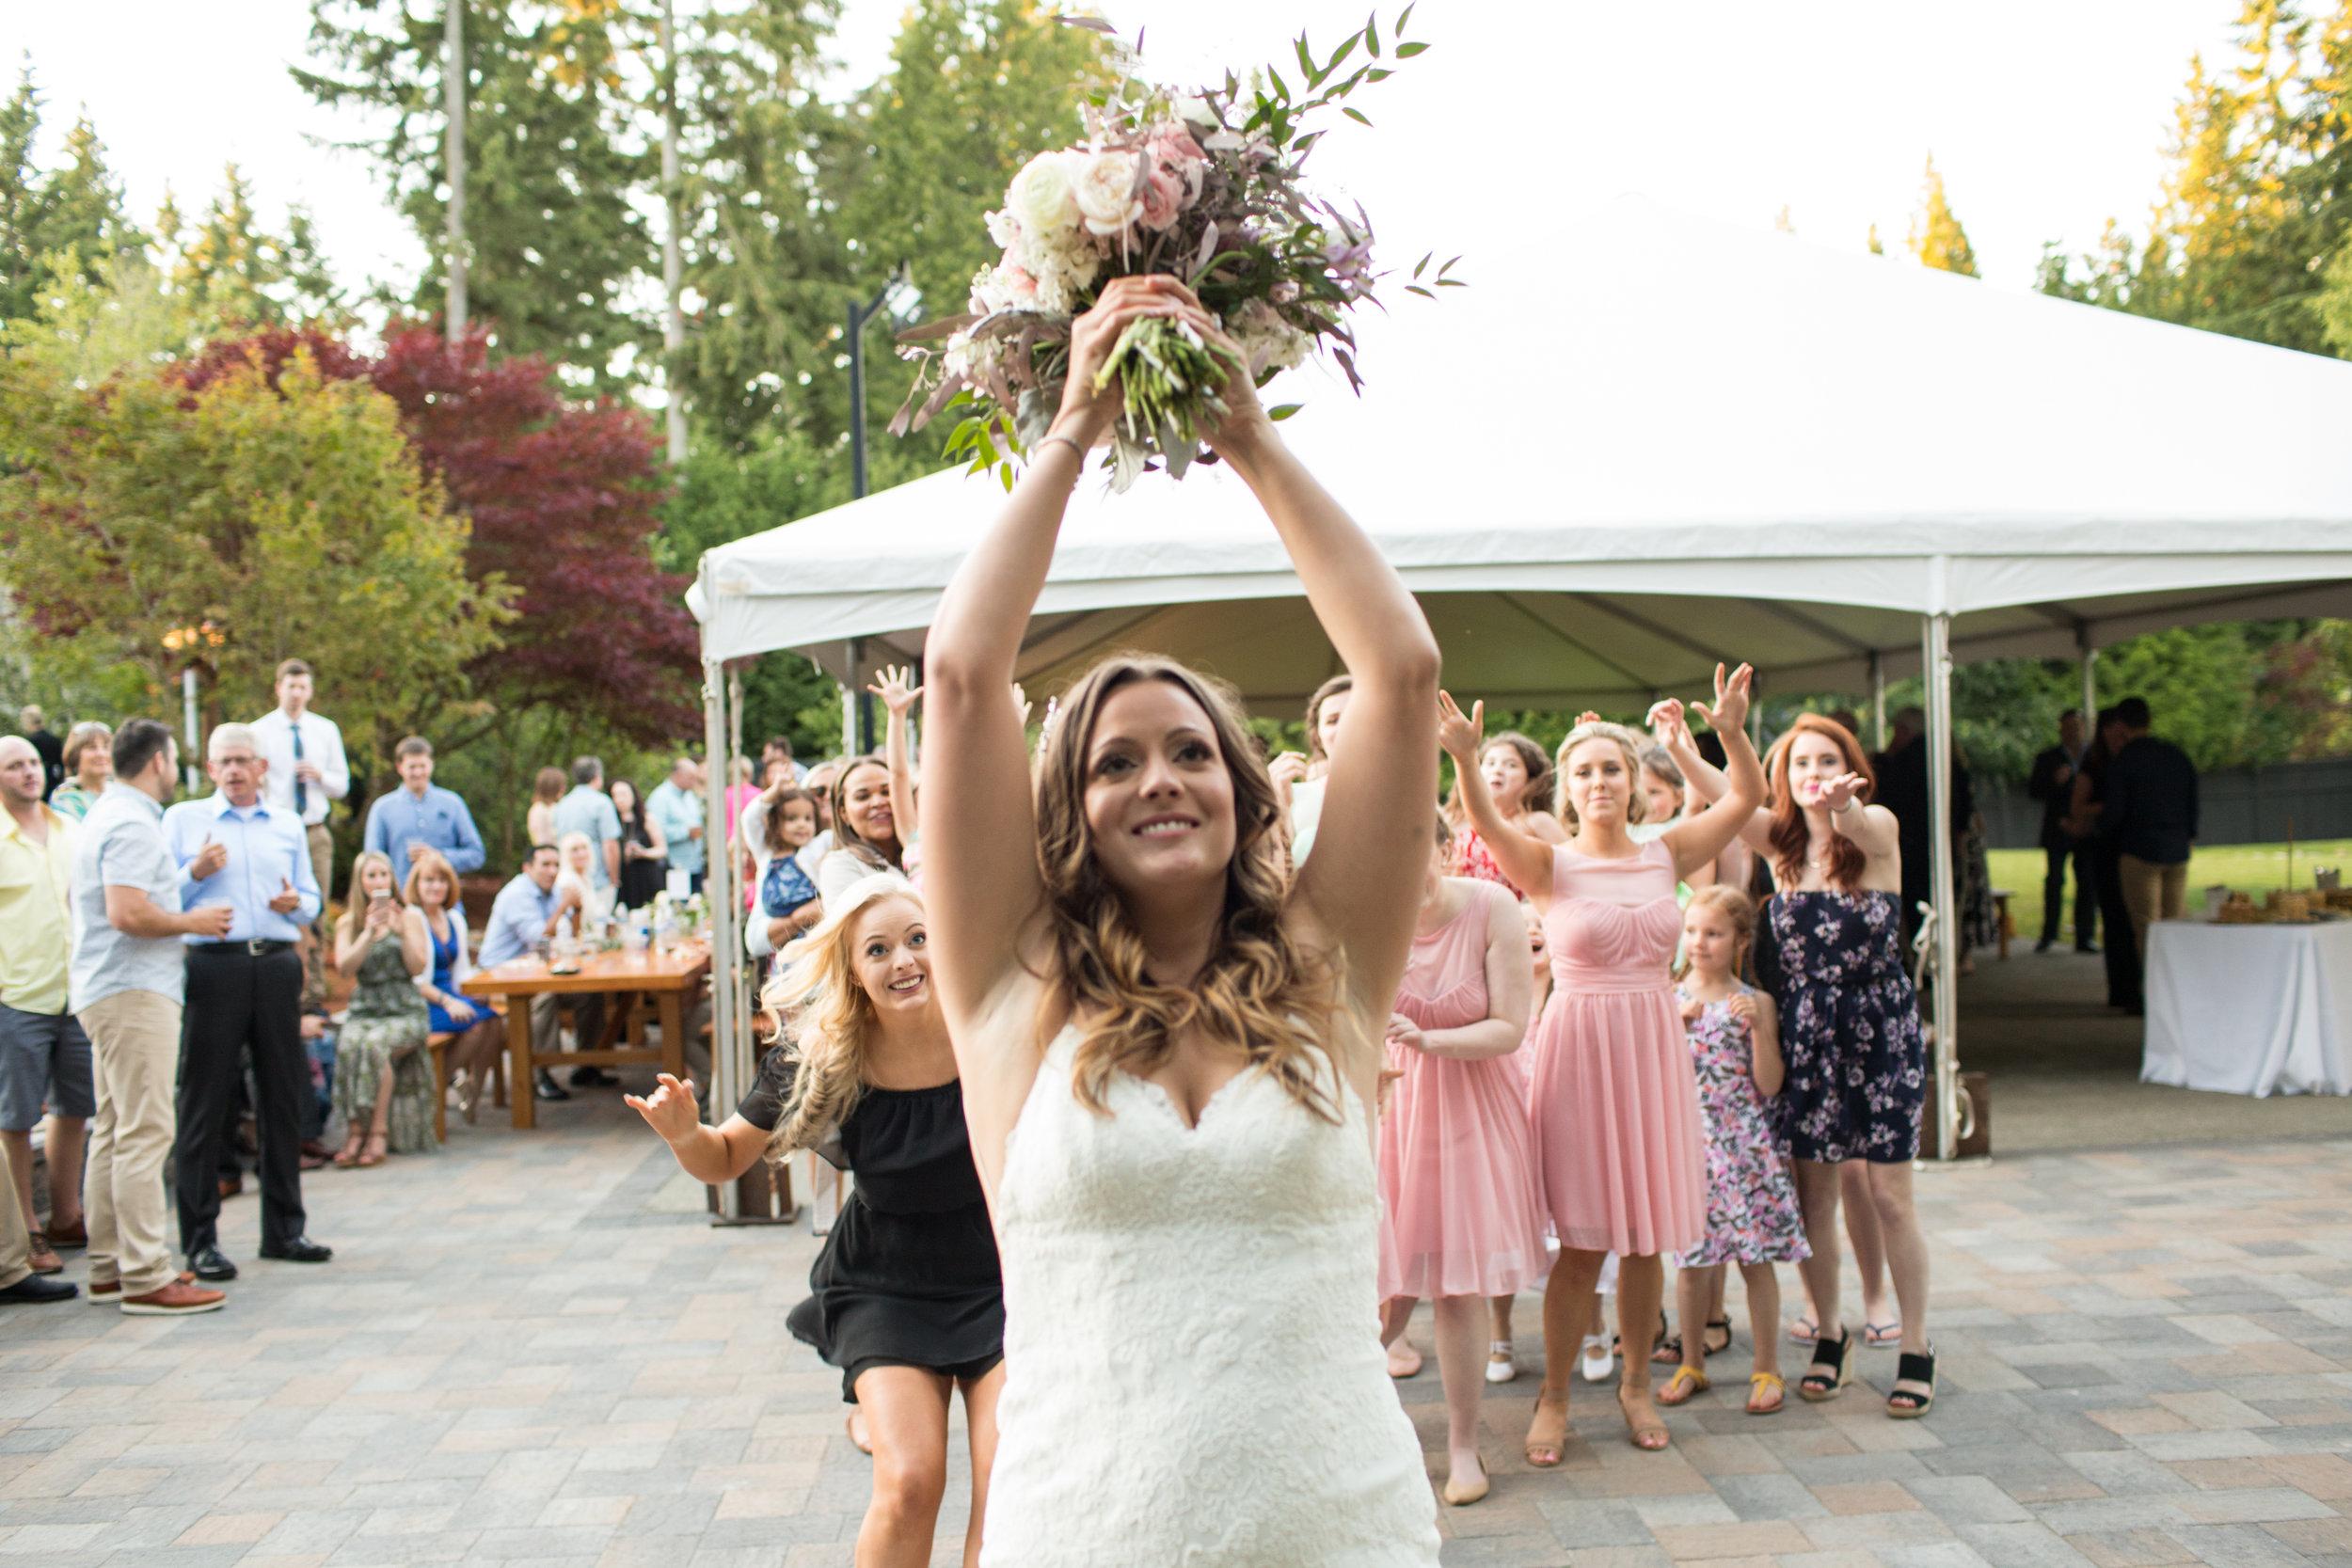 sandstrom_wedding_772.jpg